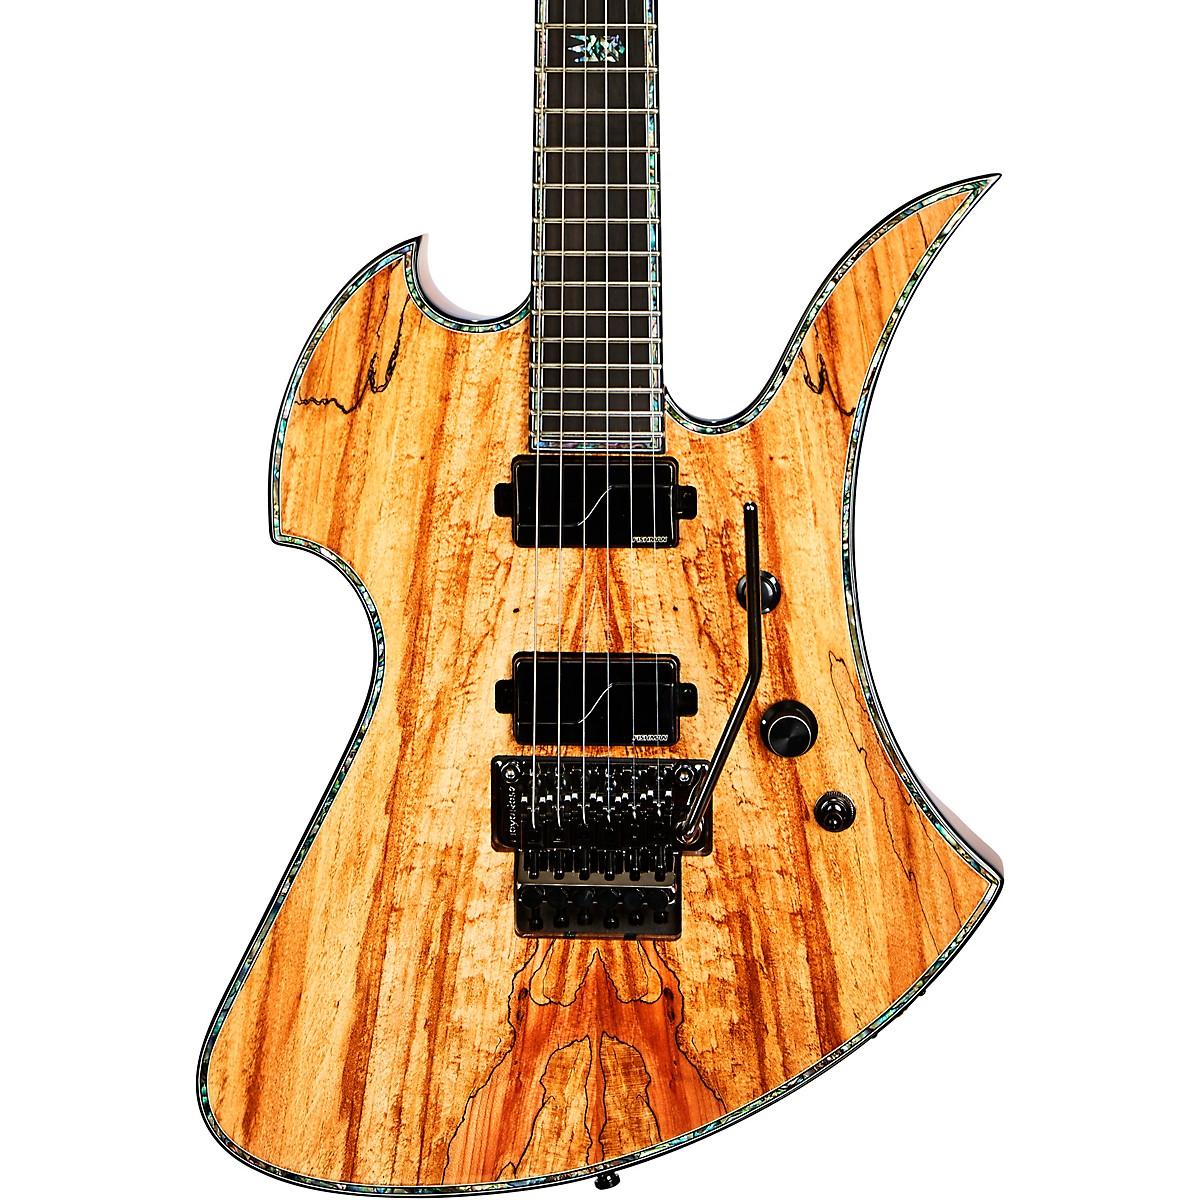 B.C. Rich Mockingbird Extreme Exotic with Floyd Rose Electric Guitar